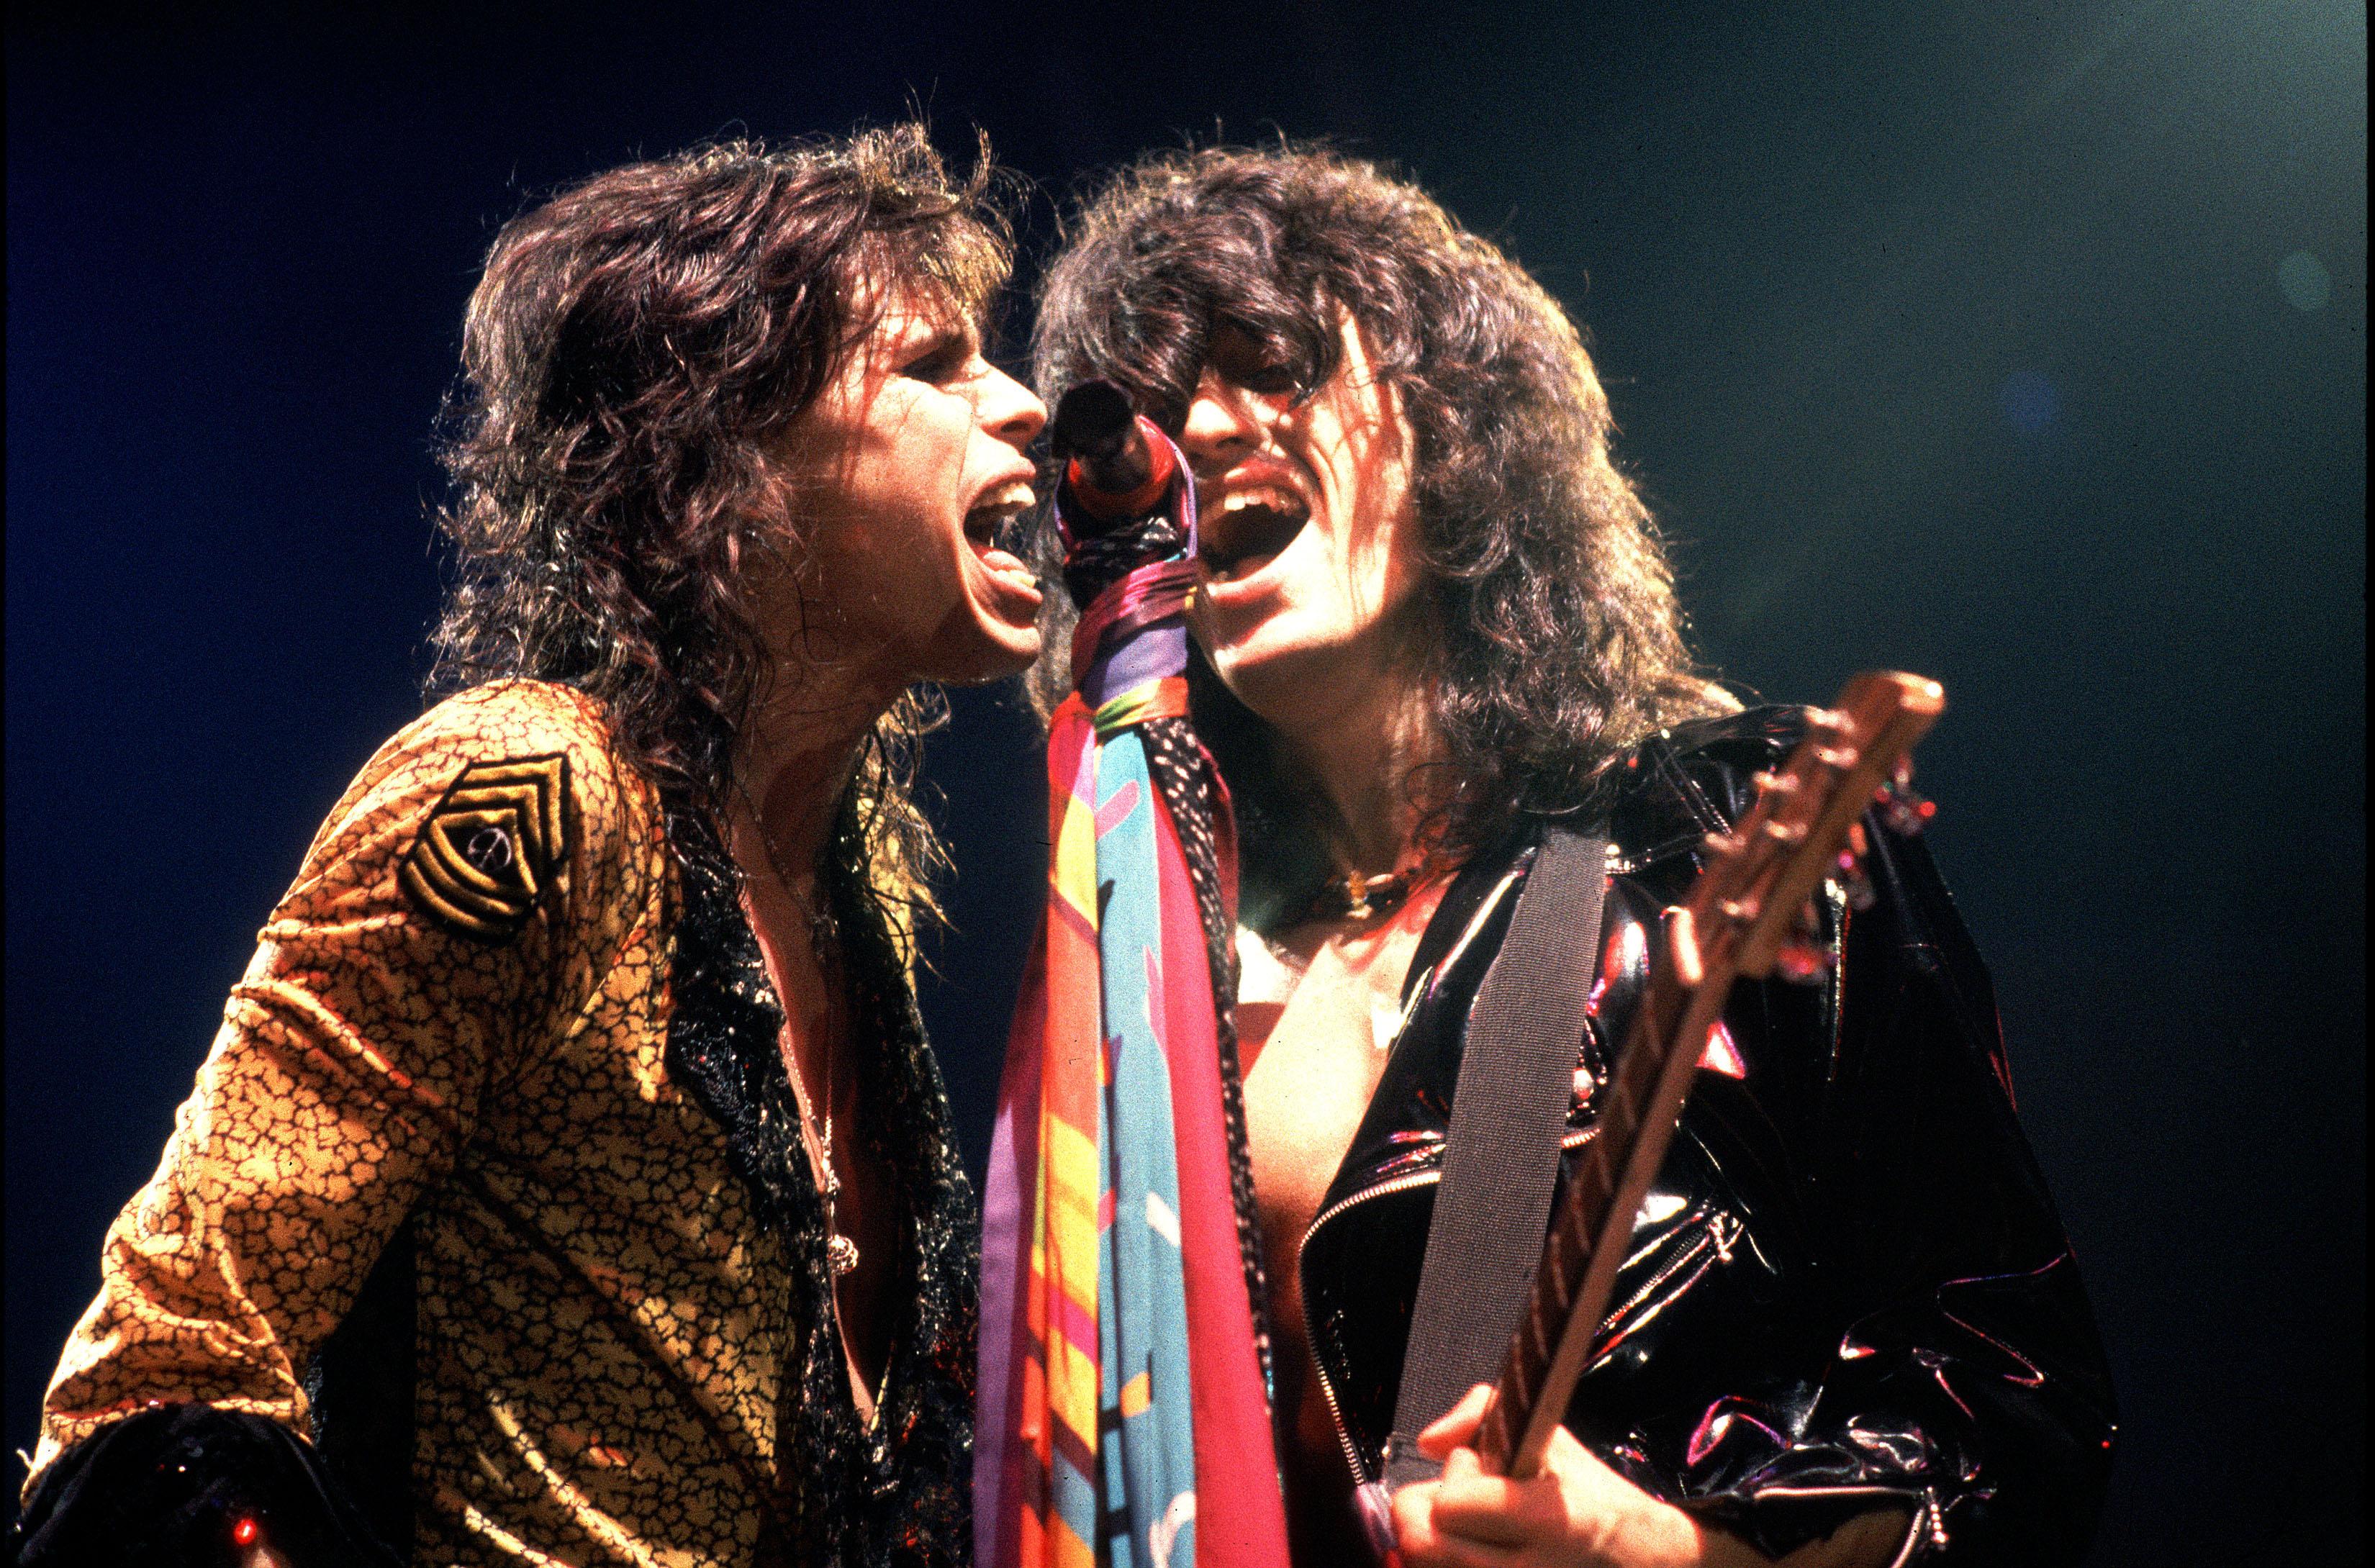 Aerosmith hard rock bands groups classic joe perry steven tyler 3300x2179